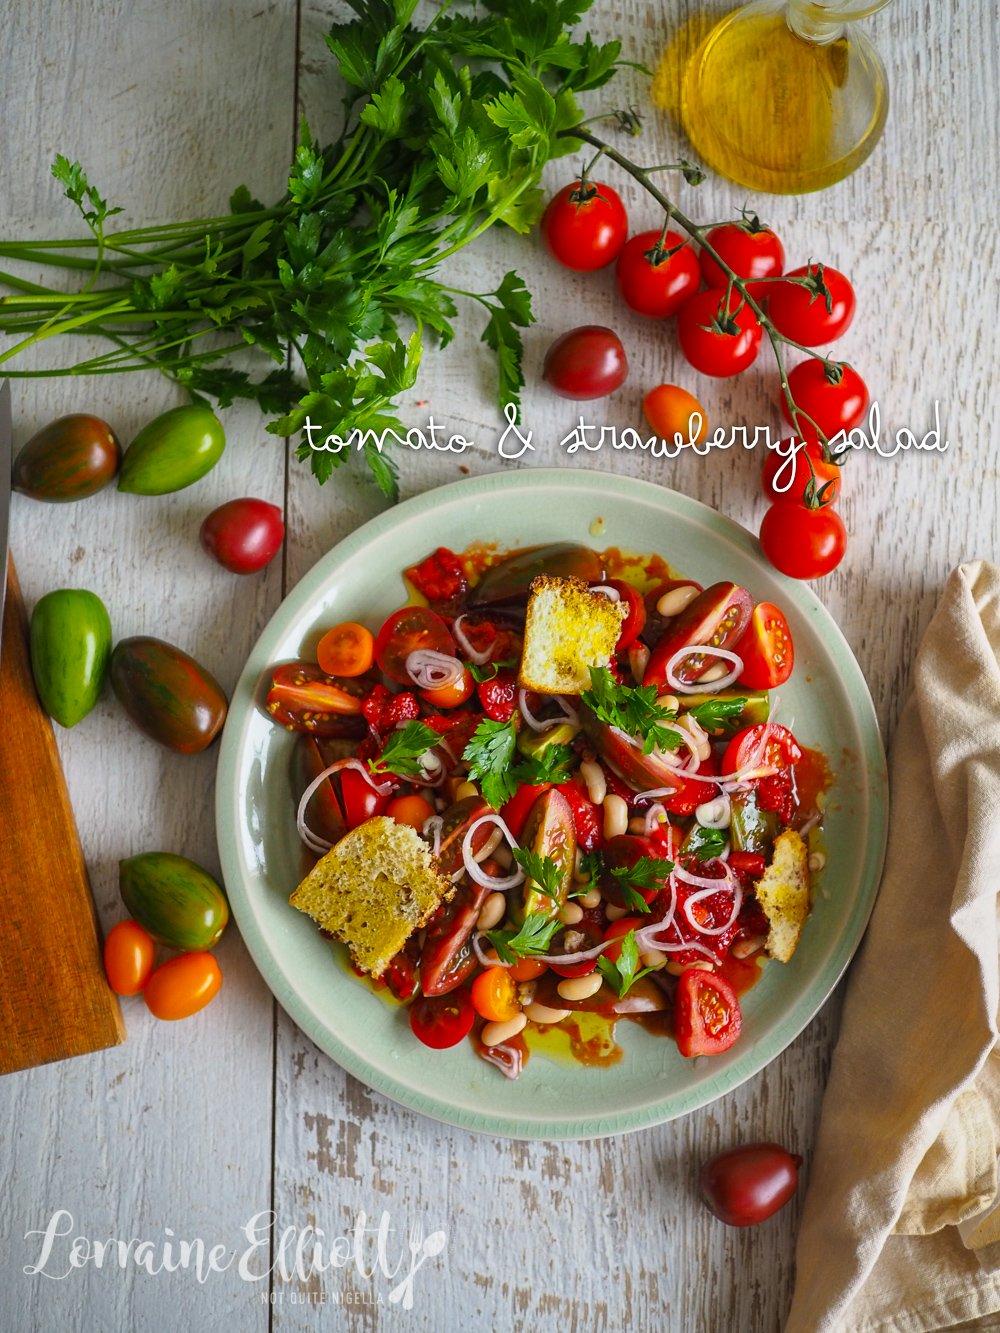 Tomato & Strawberry Salad